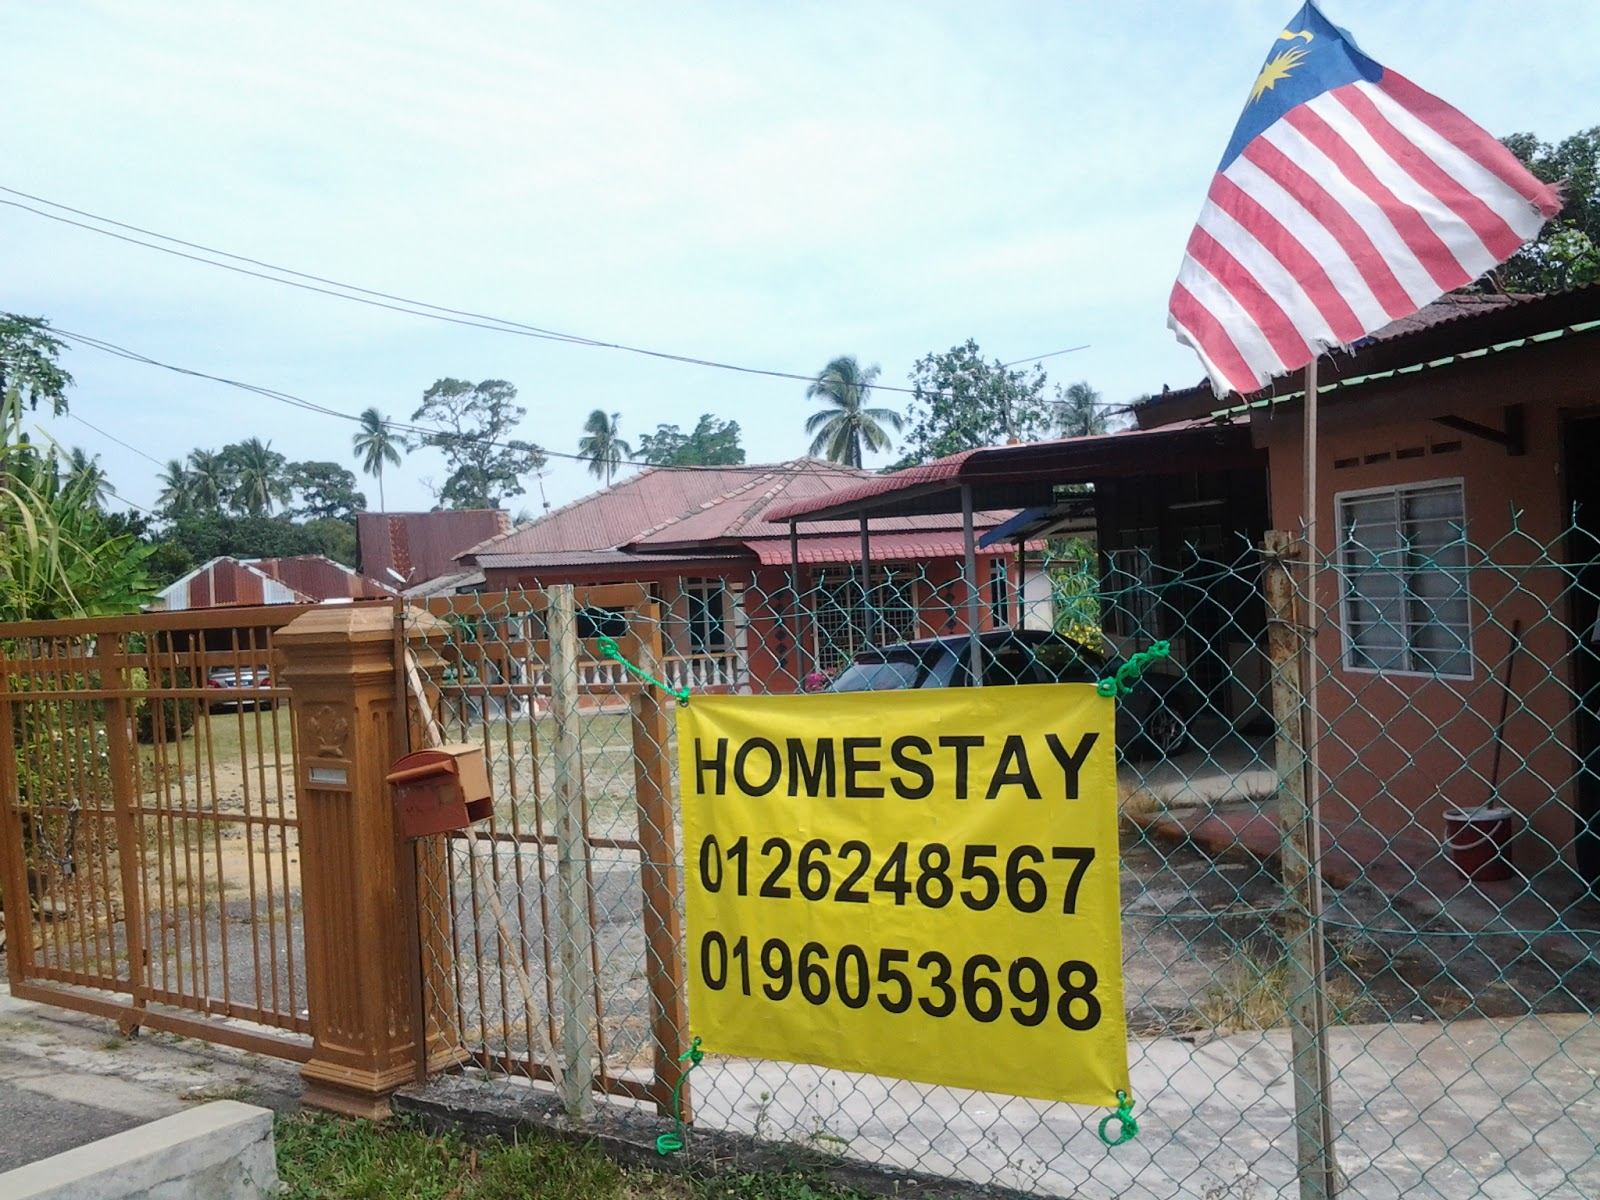 Rumah Rehat Ala Homestay Chalet Pengkalan Balak 3 Masjid Tanah Melaka